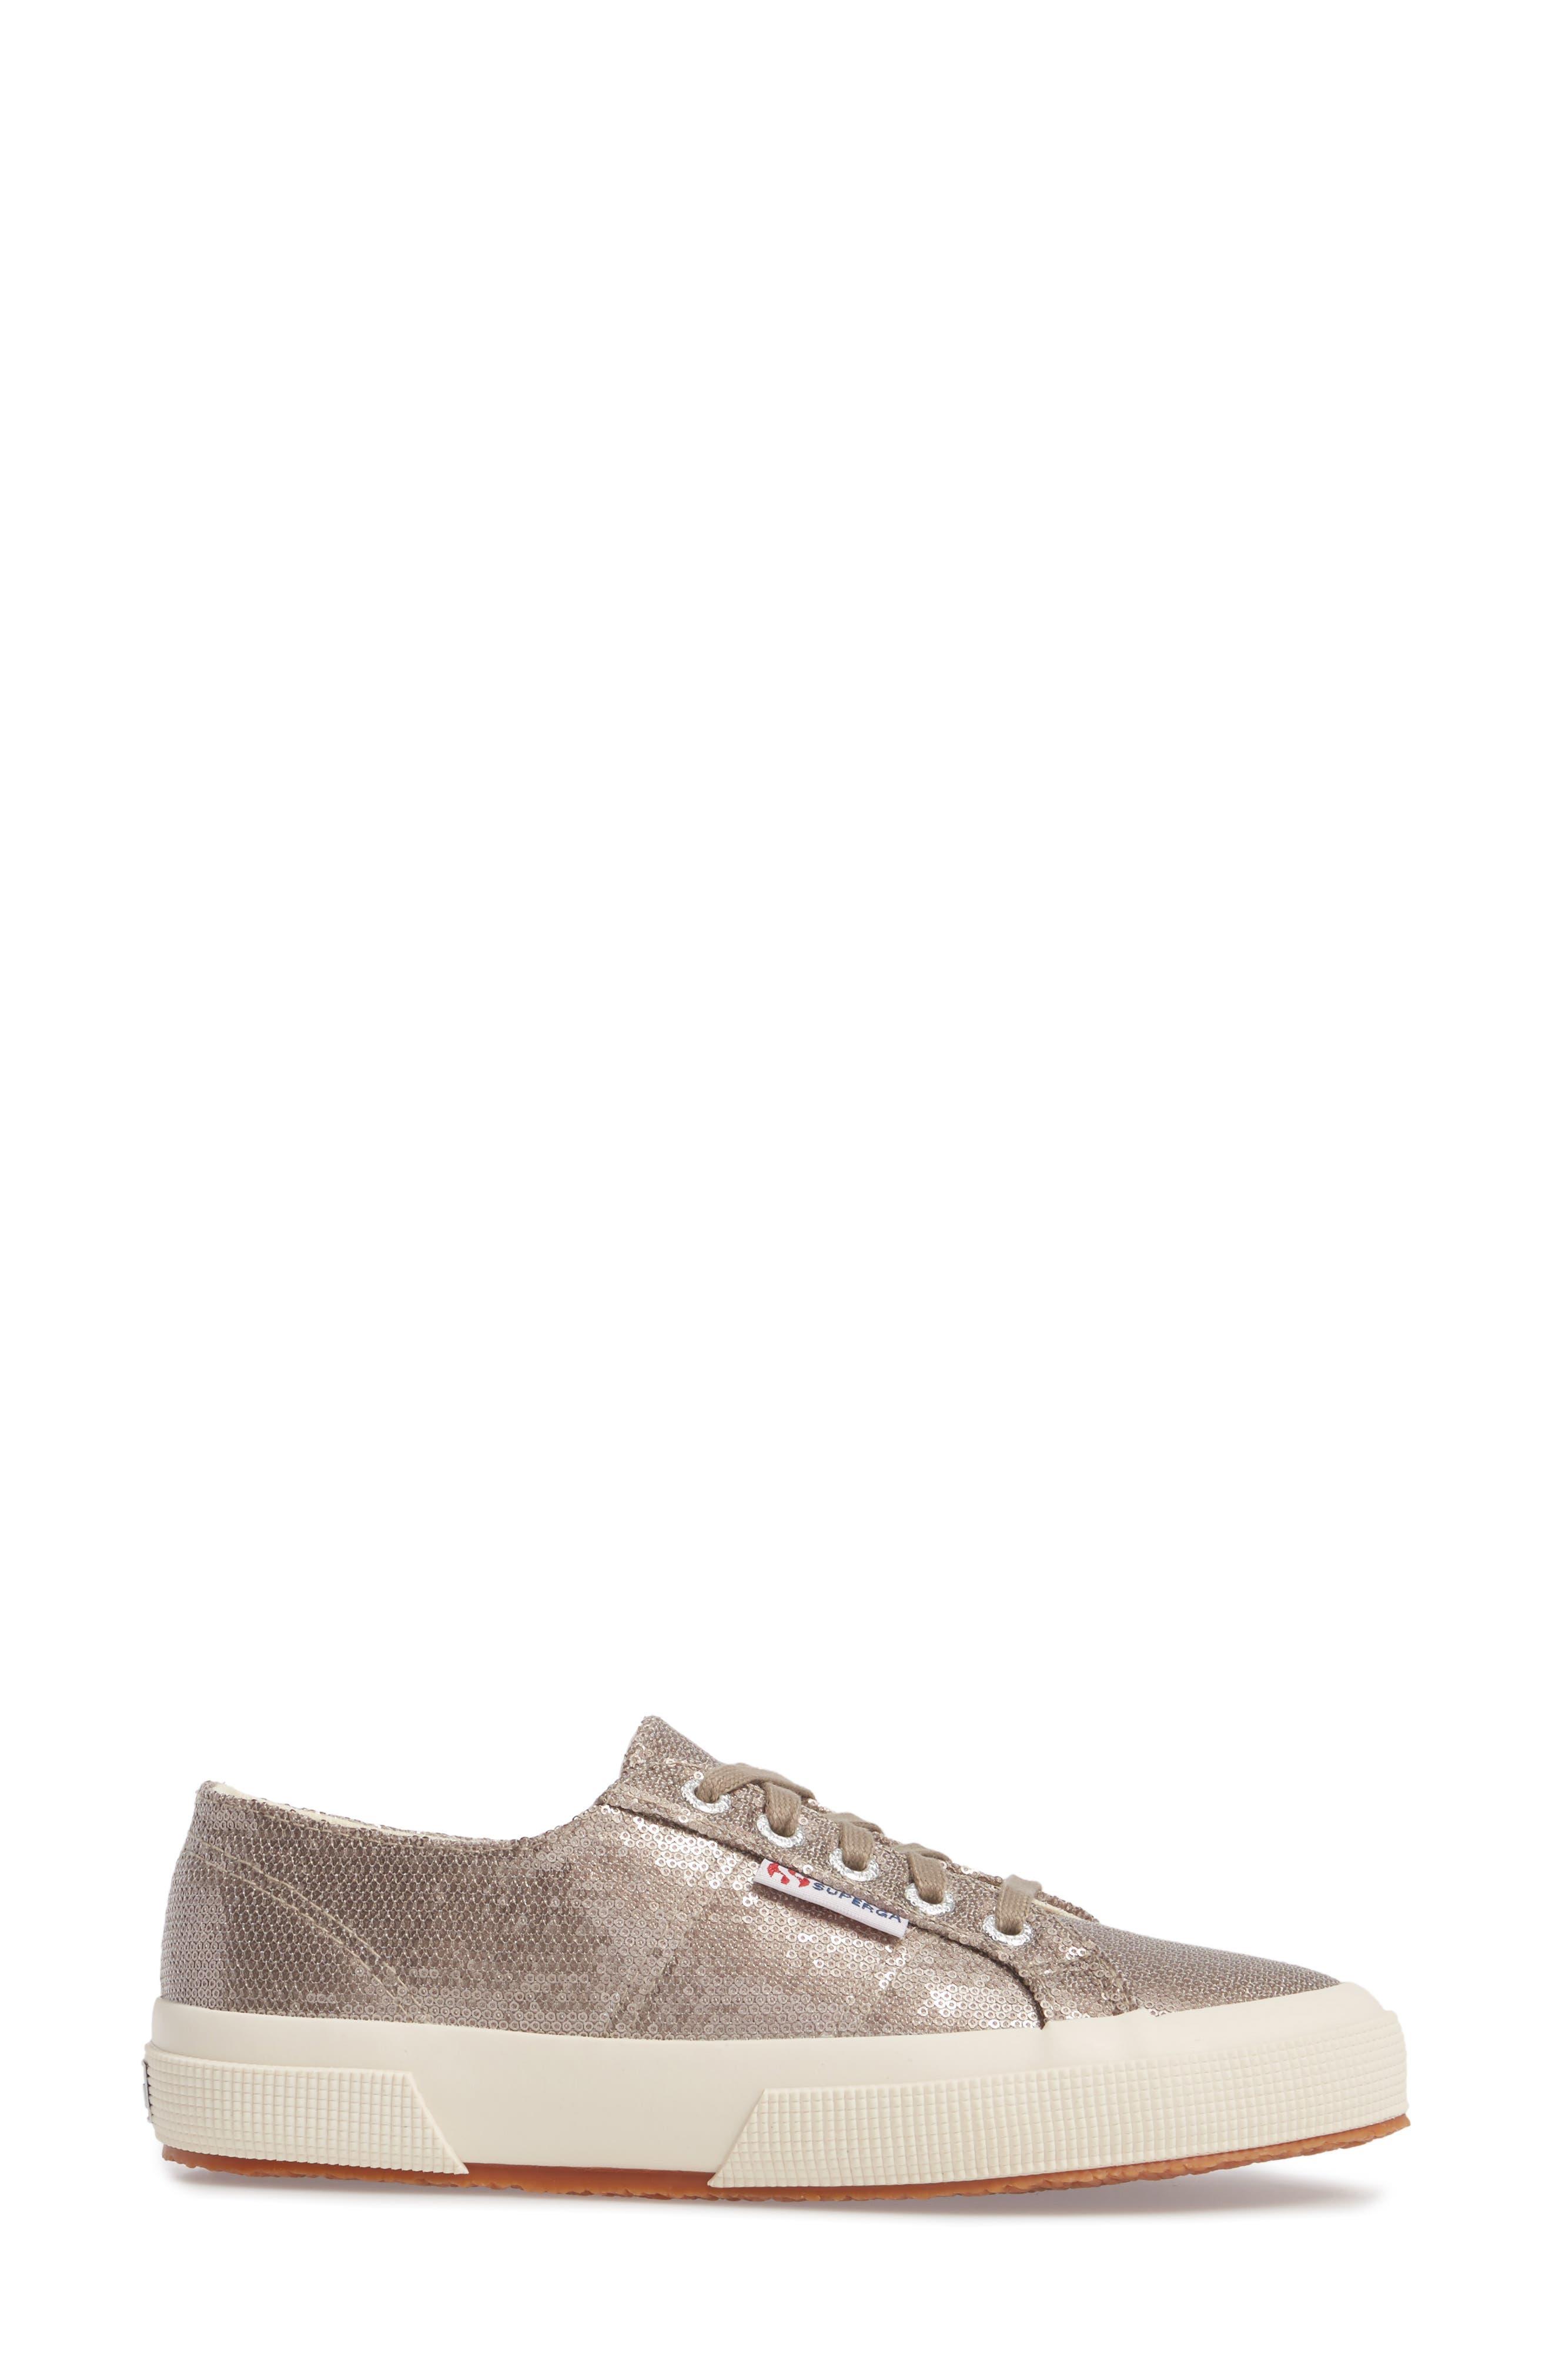 2750 Micro Sequin Sneaker,                             Alternate thumbnail 3, color,                             227